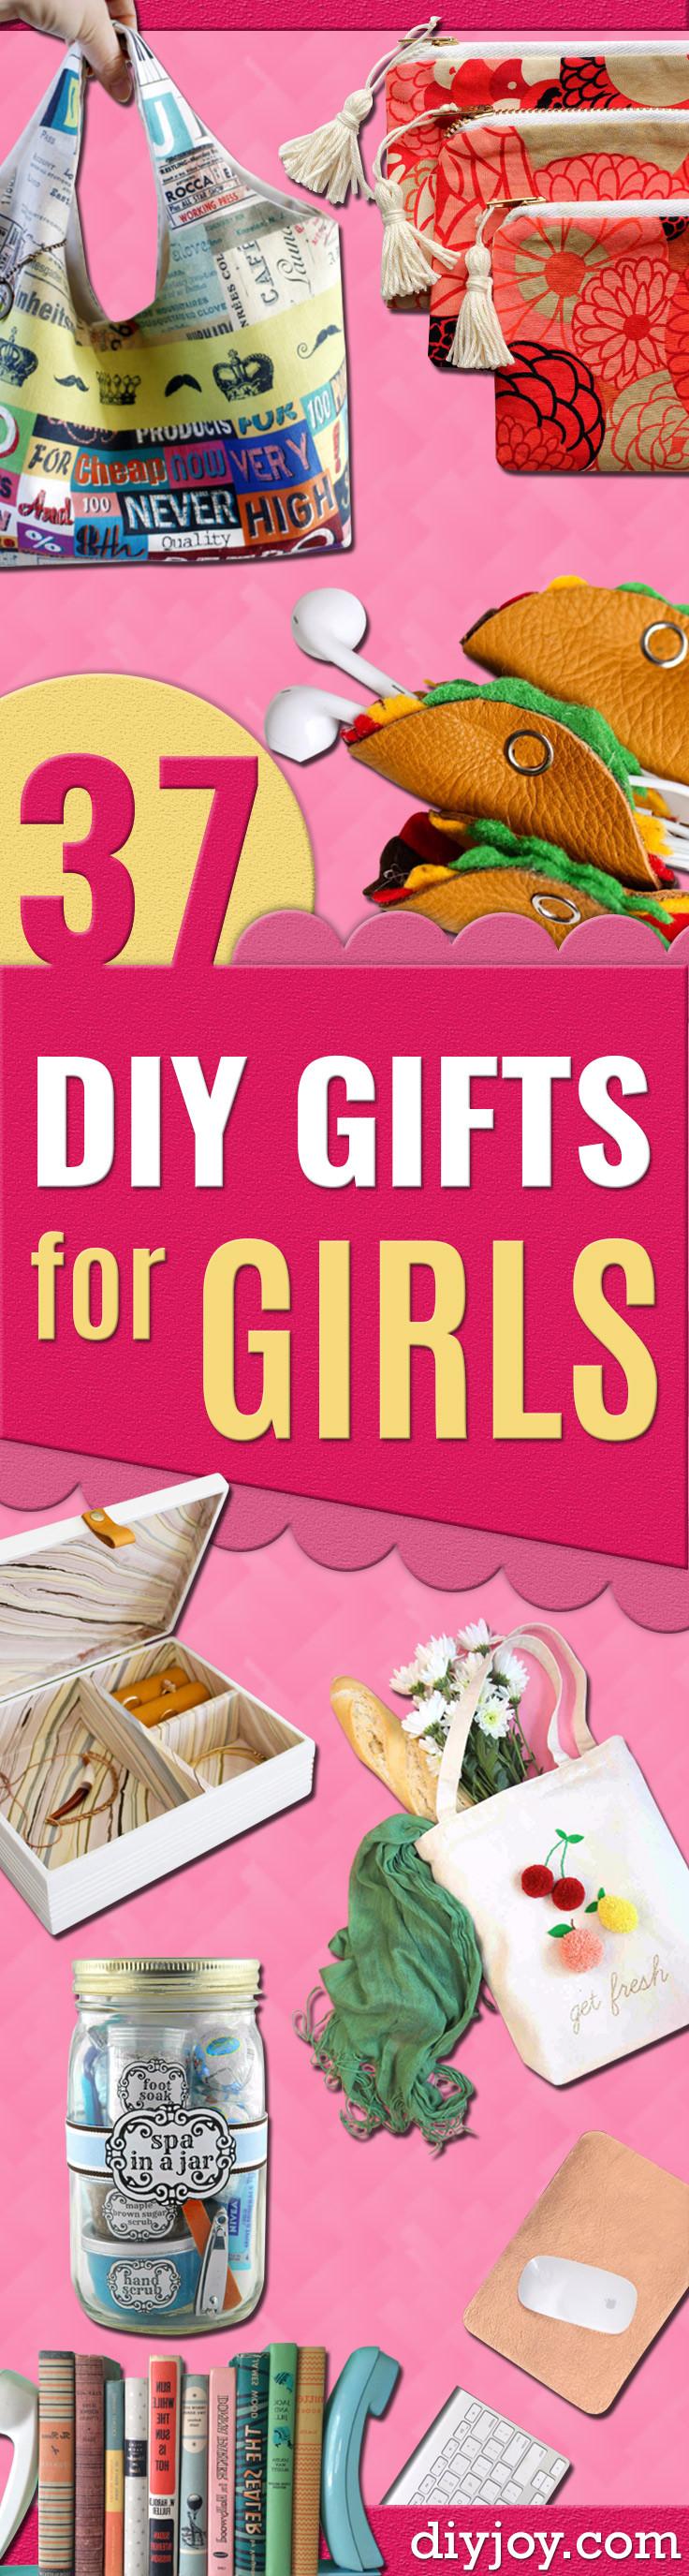 Diy Gift Ideas For Girls  37 Best DIY Gifts for Girls